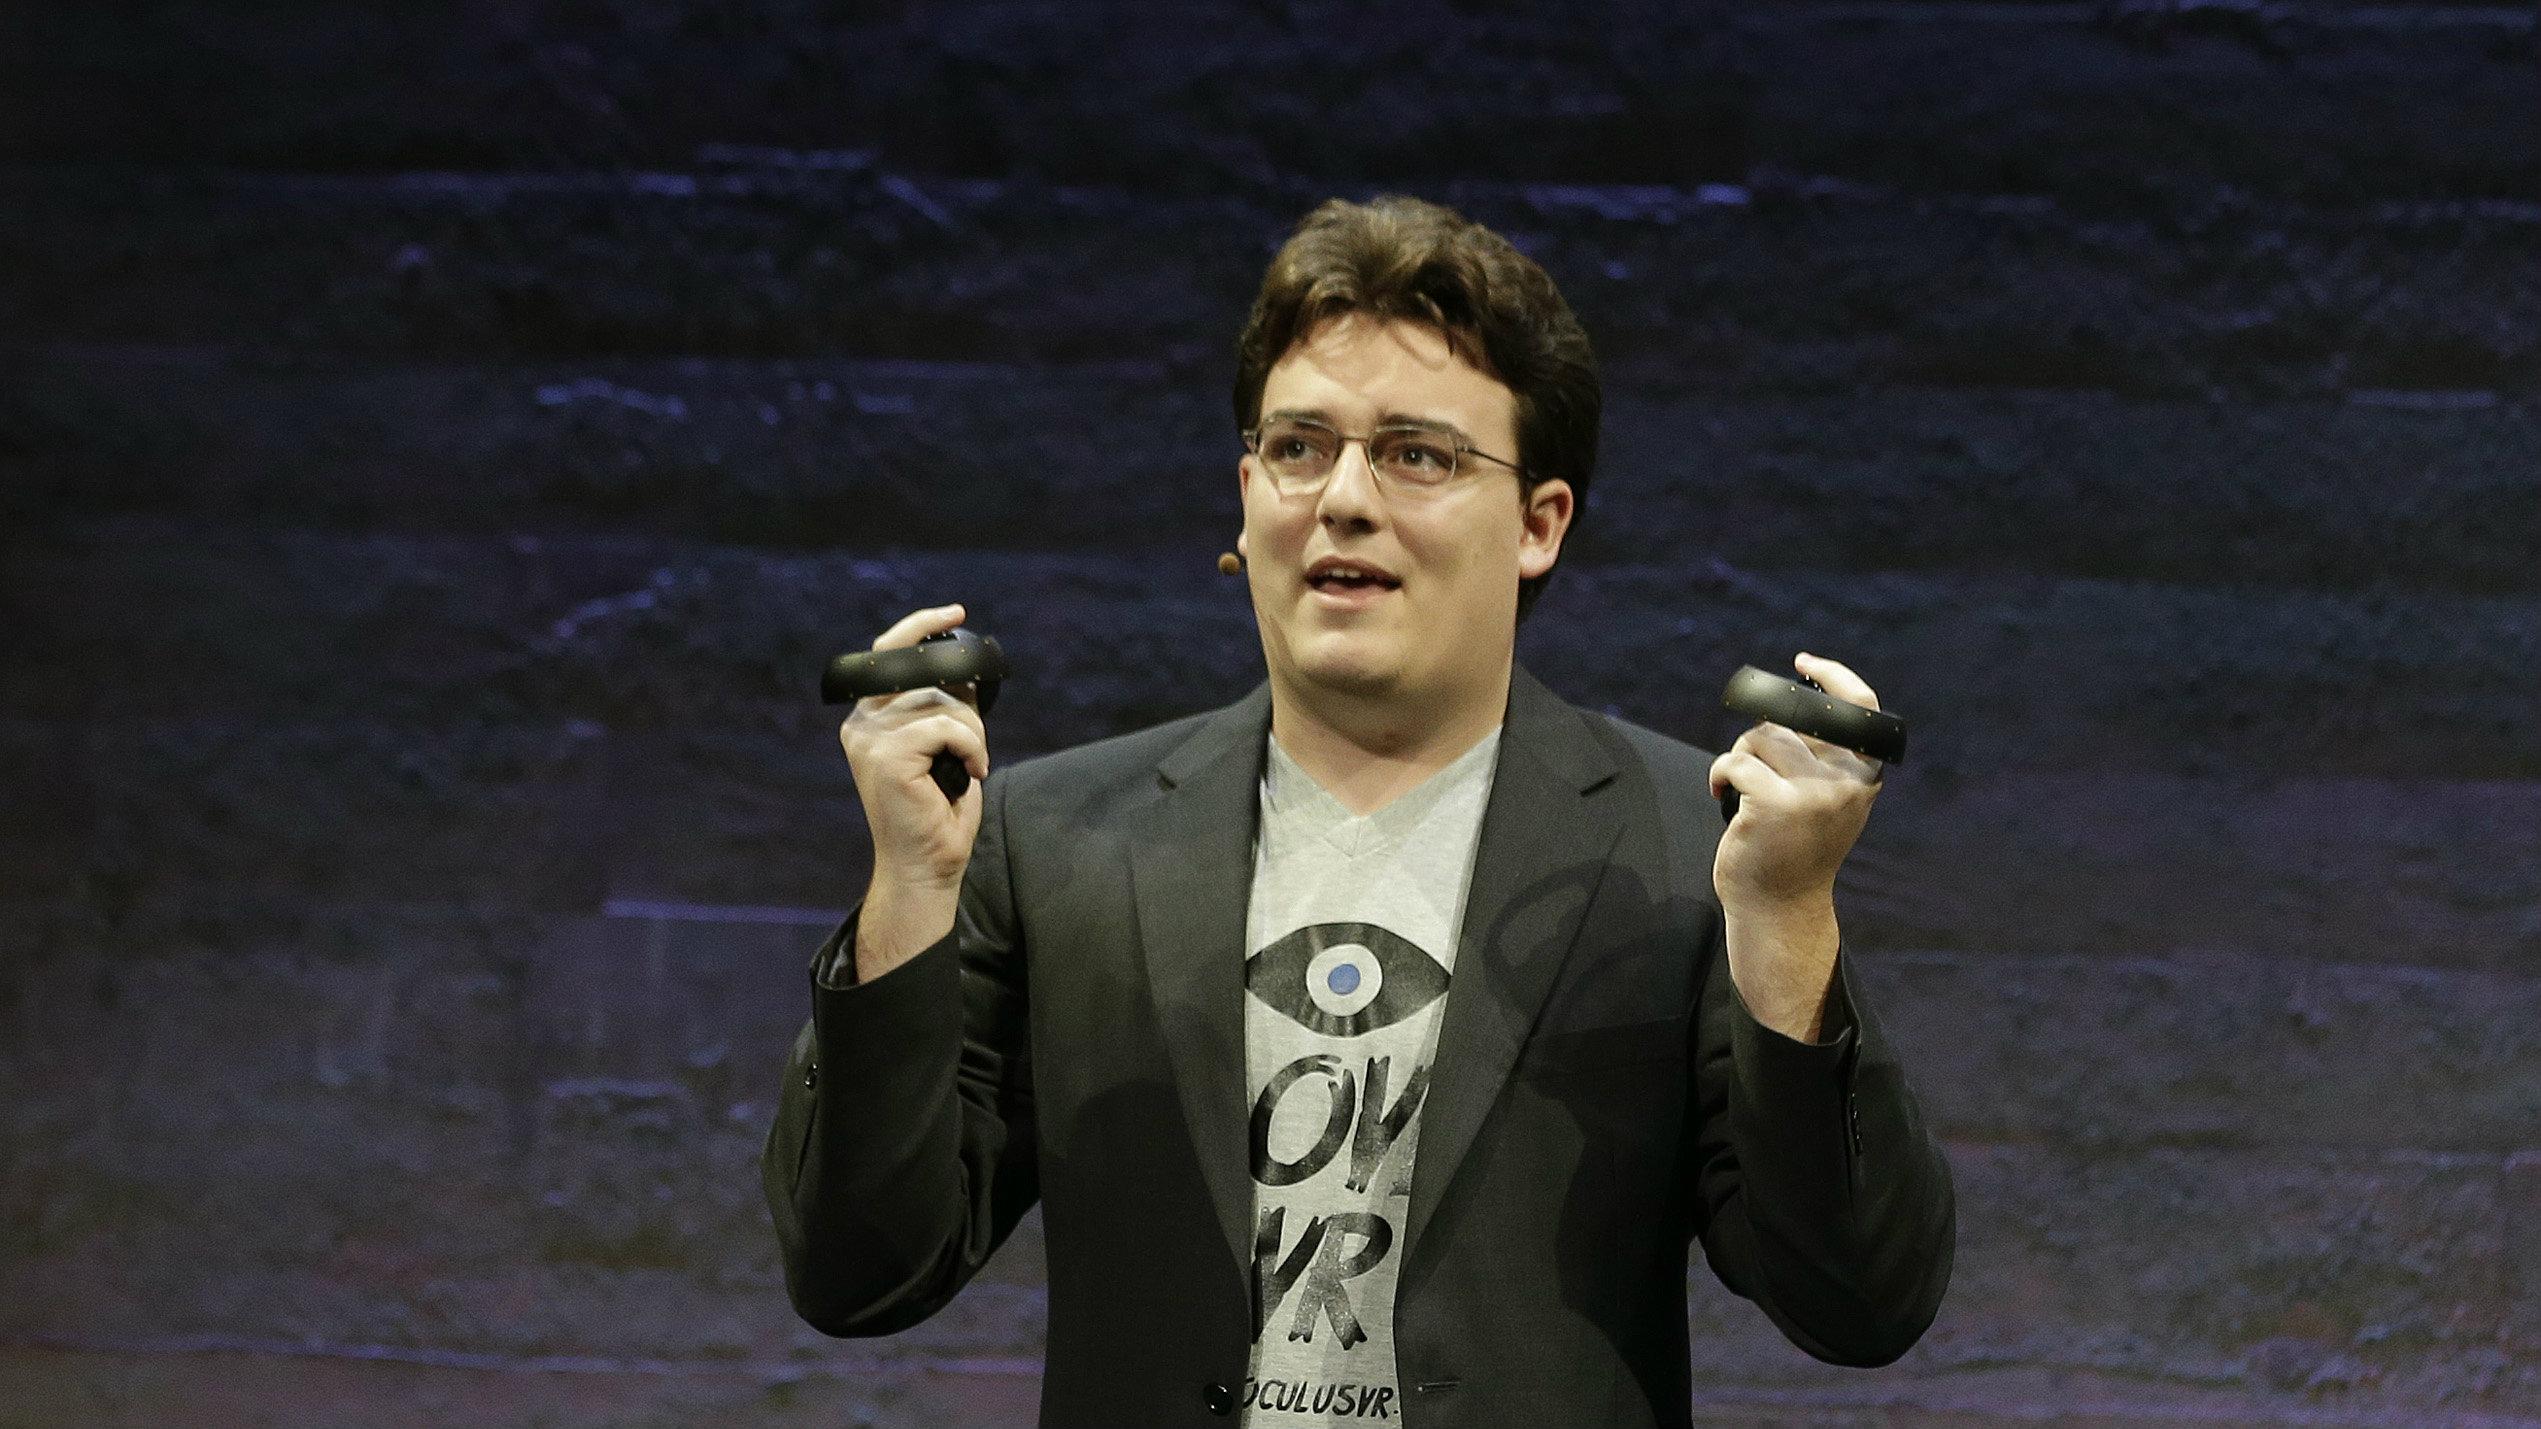 Oculus创始人Palmer Luckey:头显运行无需FB账户是基于任职期间的承诺